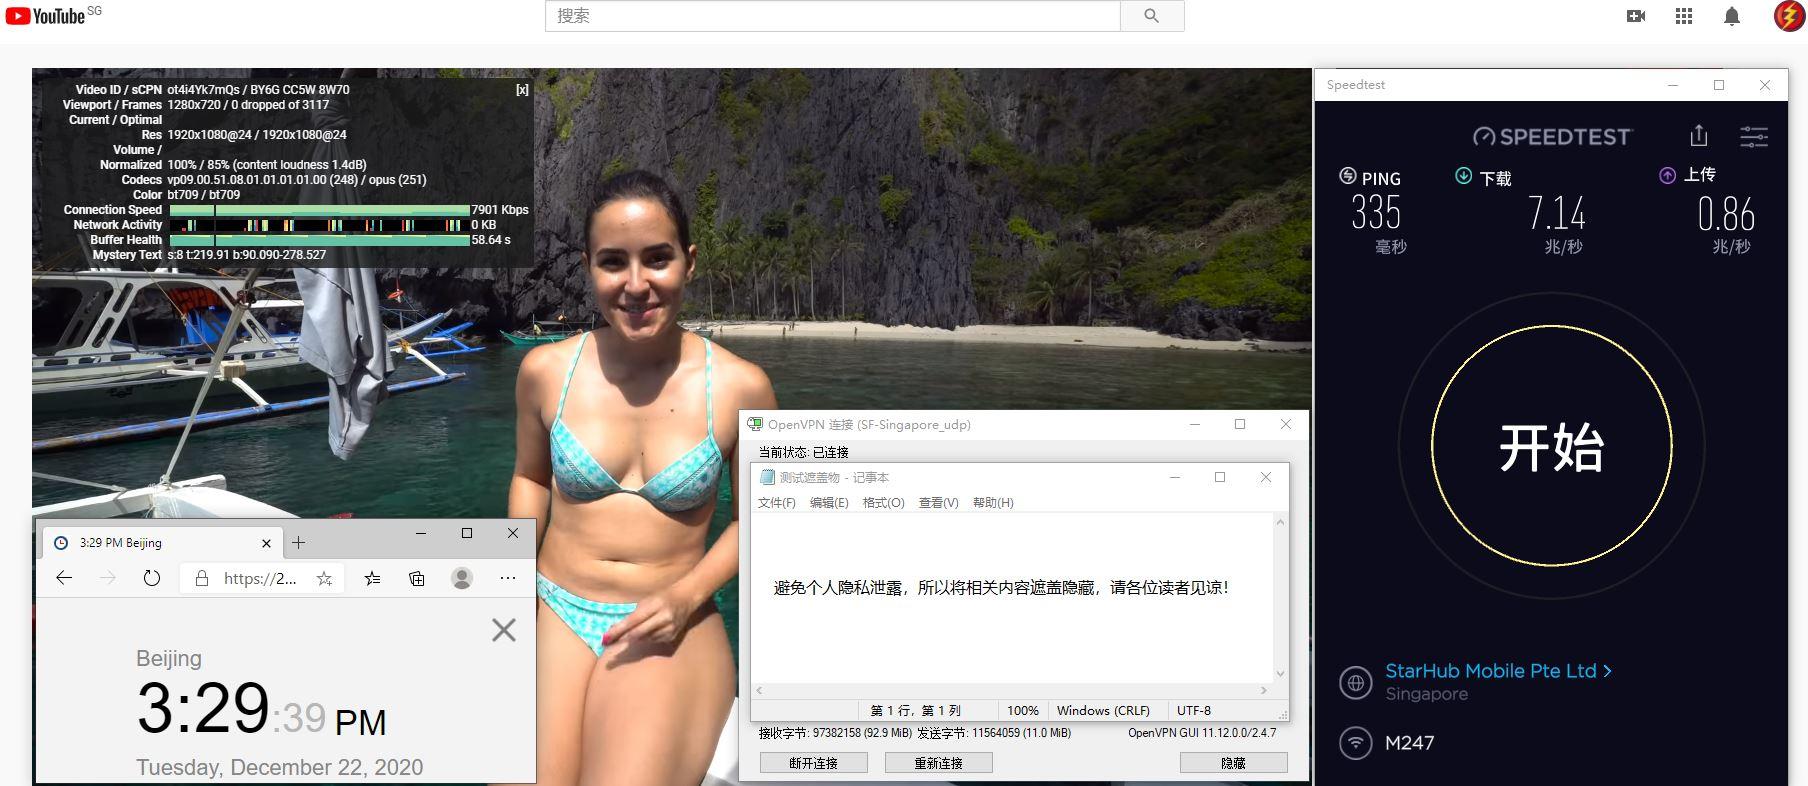 Windows10 SurfsharkVPN Singapore 服务器 中国VPN 翻墙 科学上网 测试 - 20201222